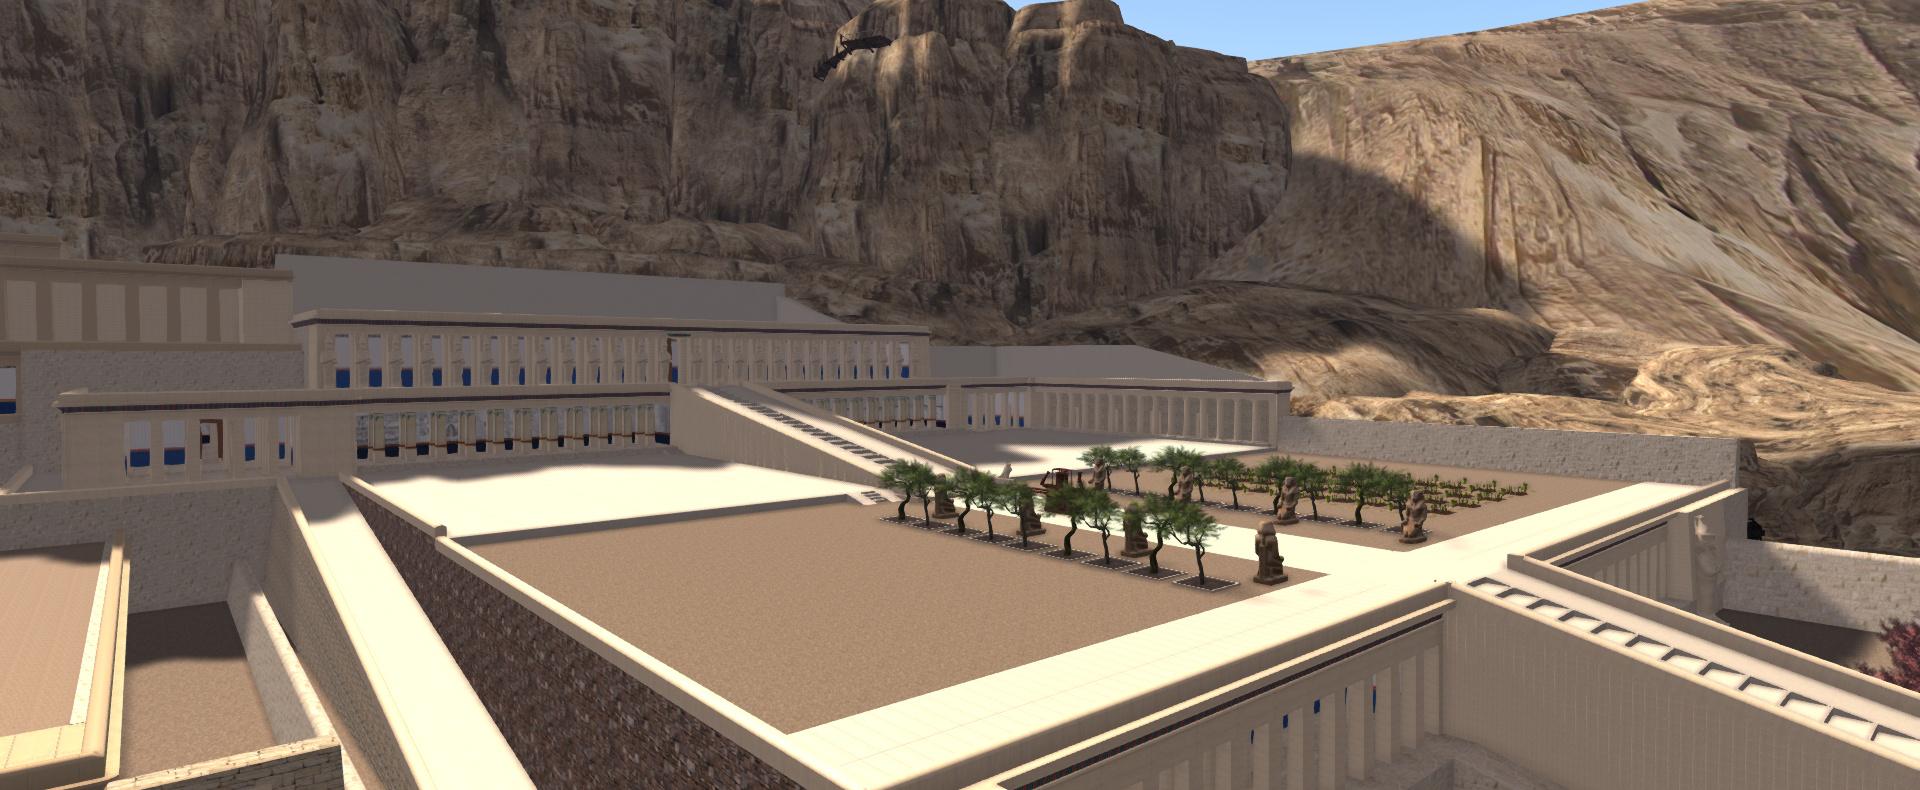 The Mortuary Temple of Hatshepsut